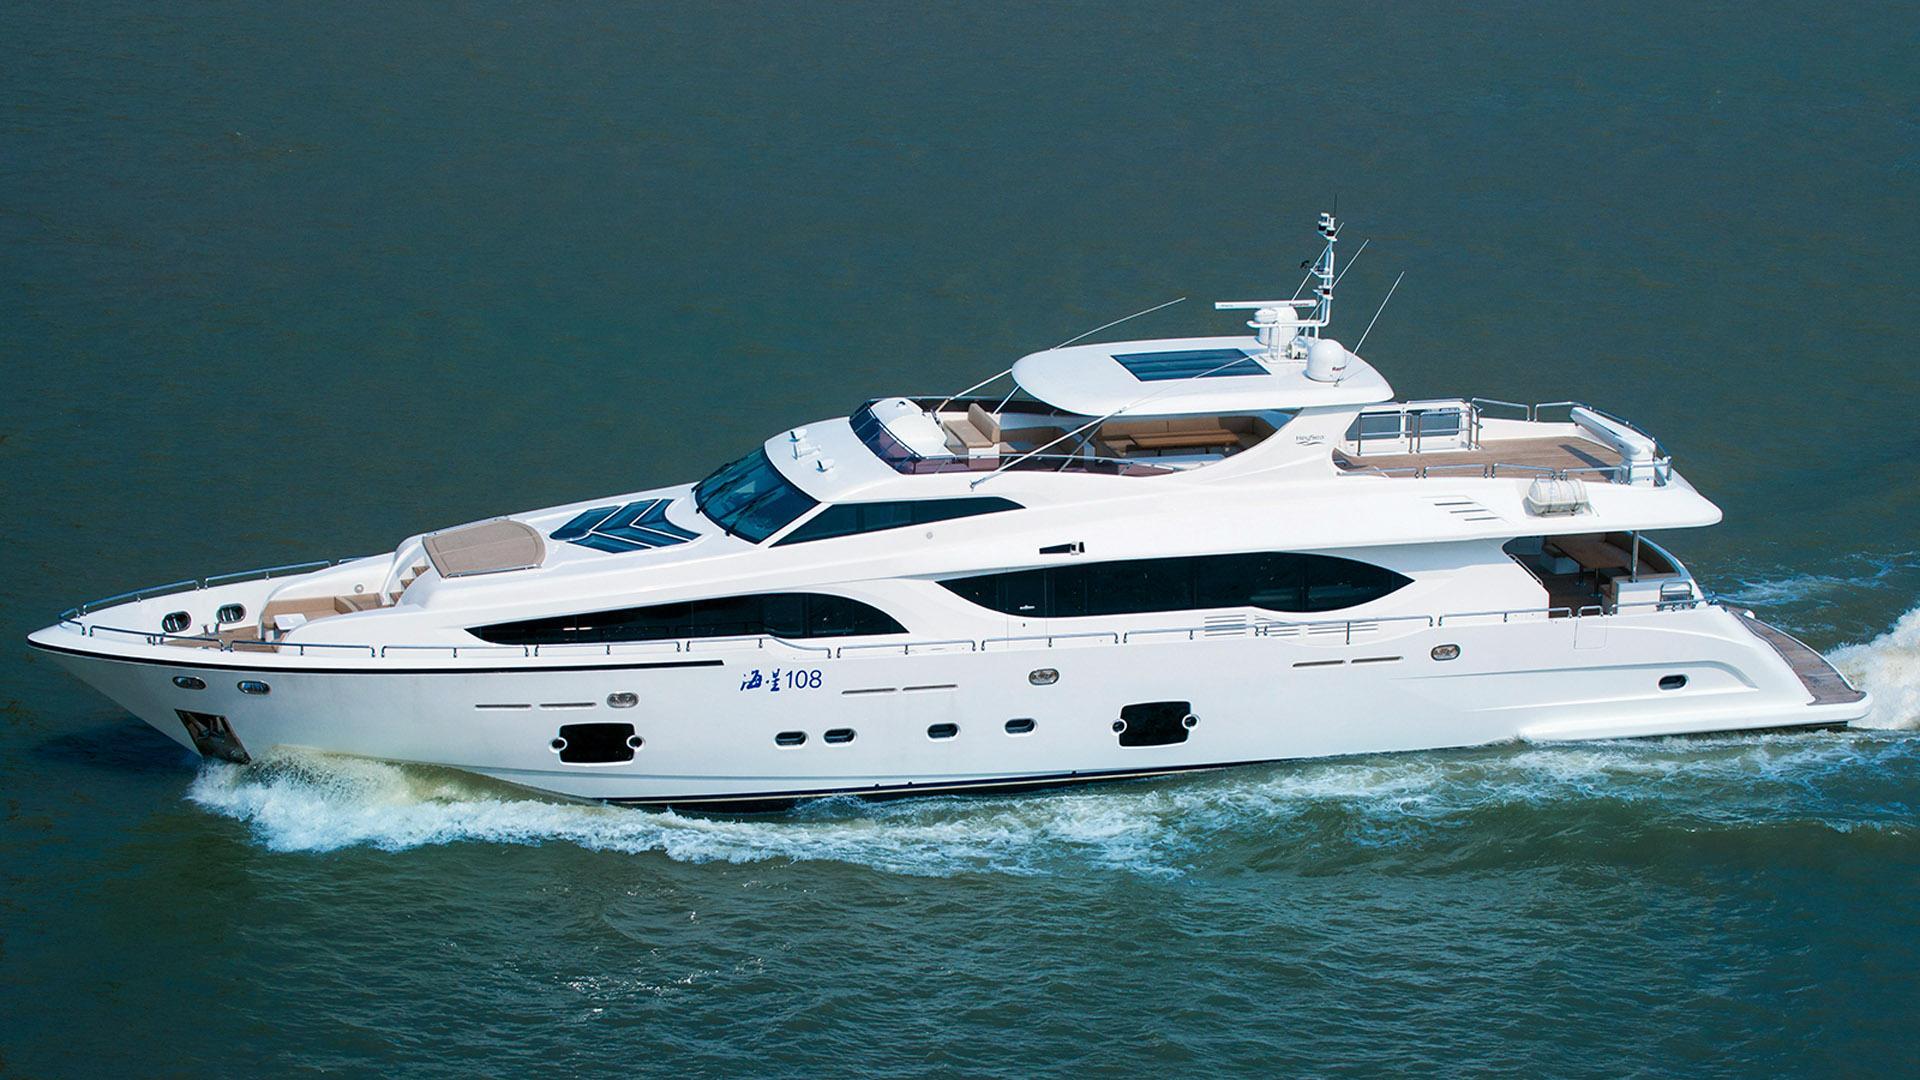 asteria 108 hull 5 motoryacht heysea 2015 33m profile sistership